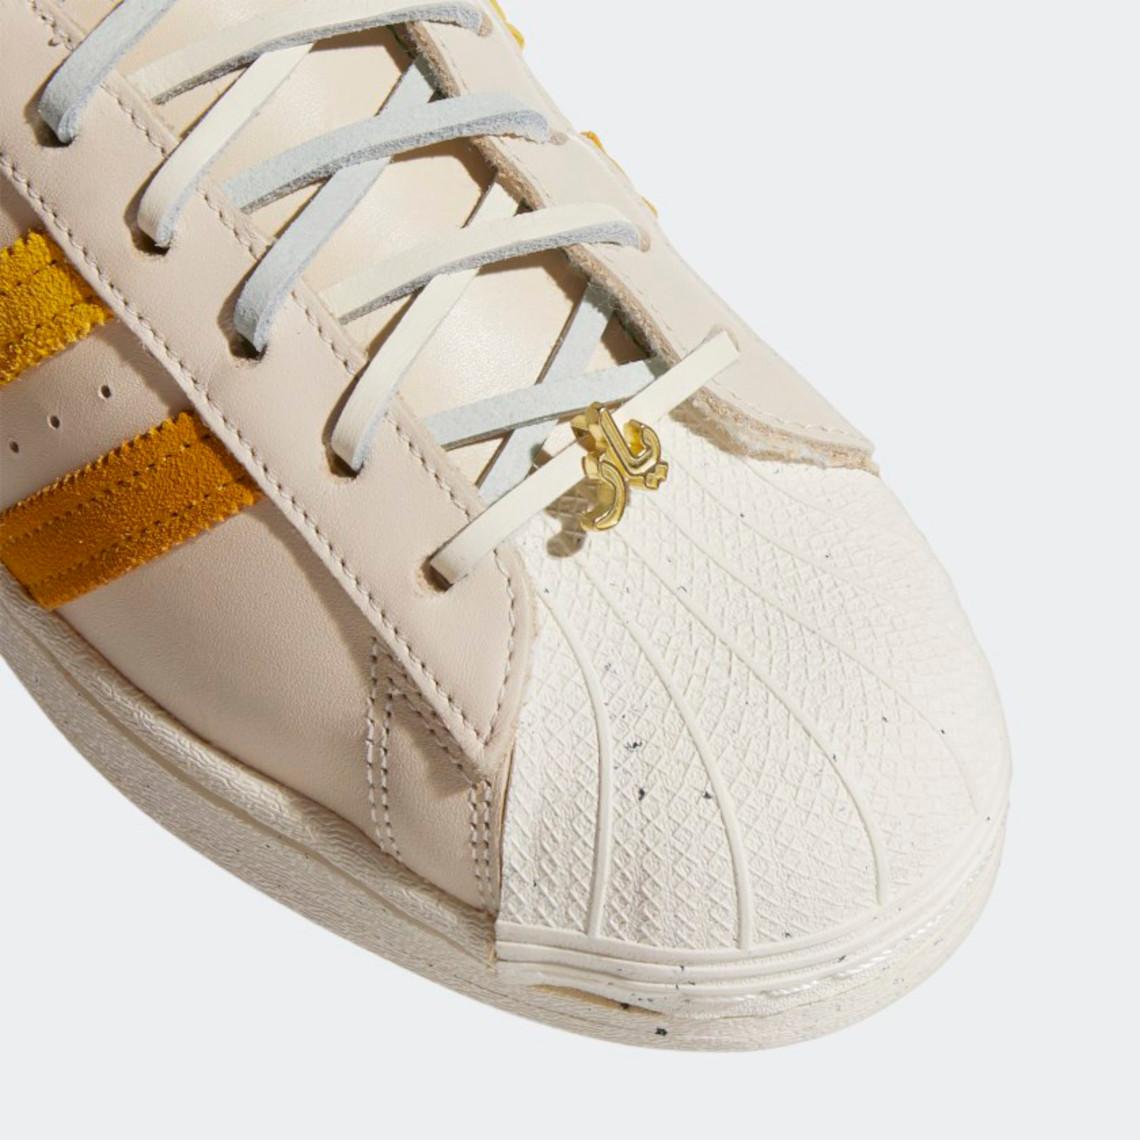 Yara Shahidi adidas Superstar Legacy Gold GZ2764 | SneakerNews.com